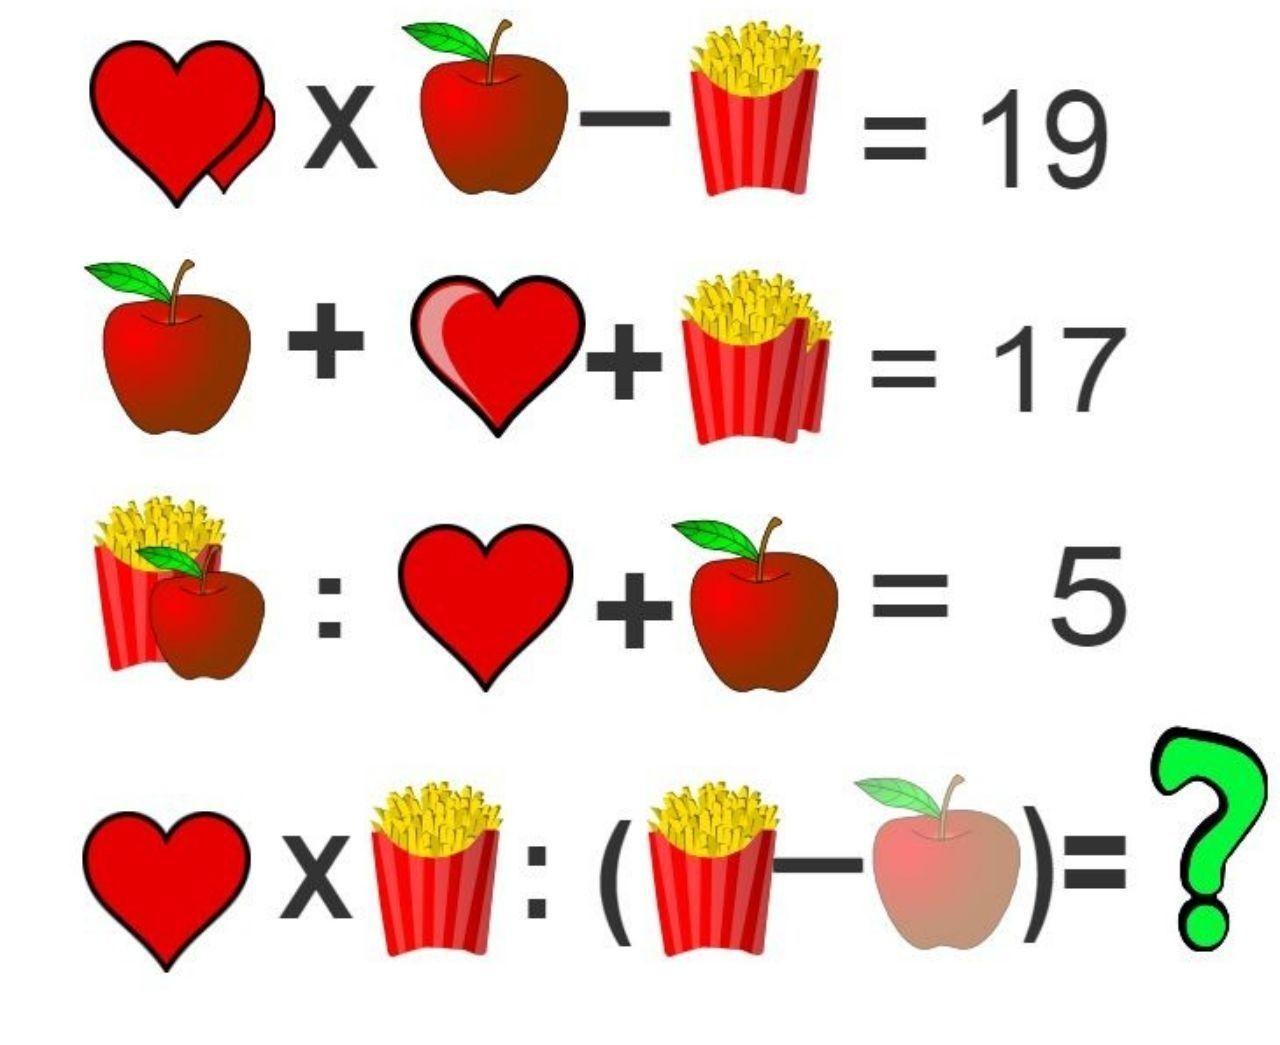 Pin By Sarka P On Matematika Maths Puzzles Math Logic Puzzles Math Pictures